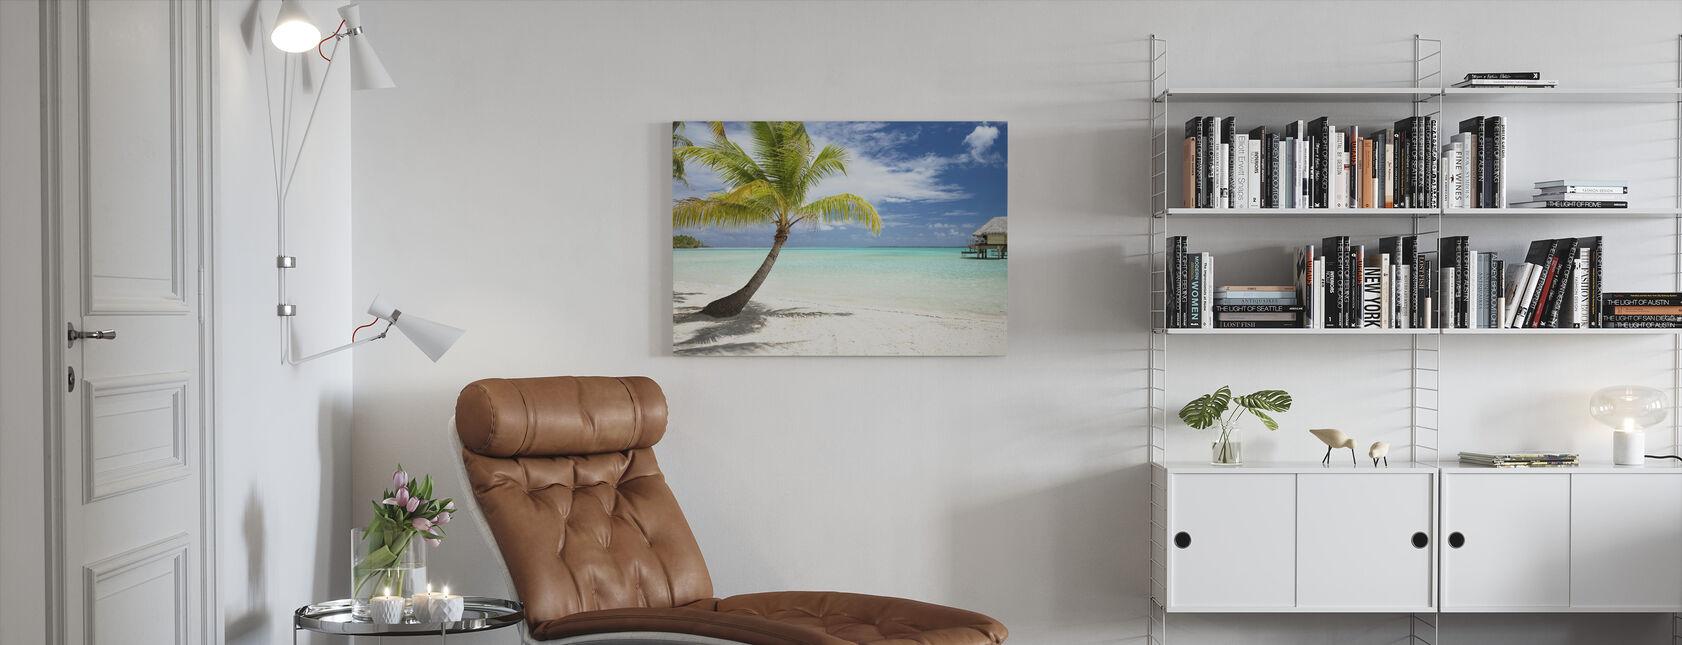 Beach Bungalovit - Canvastaulu - Olohuone